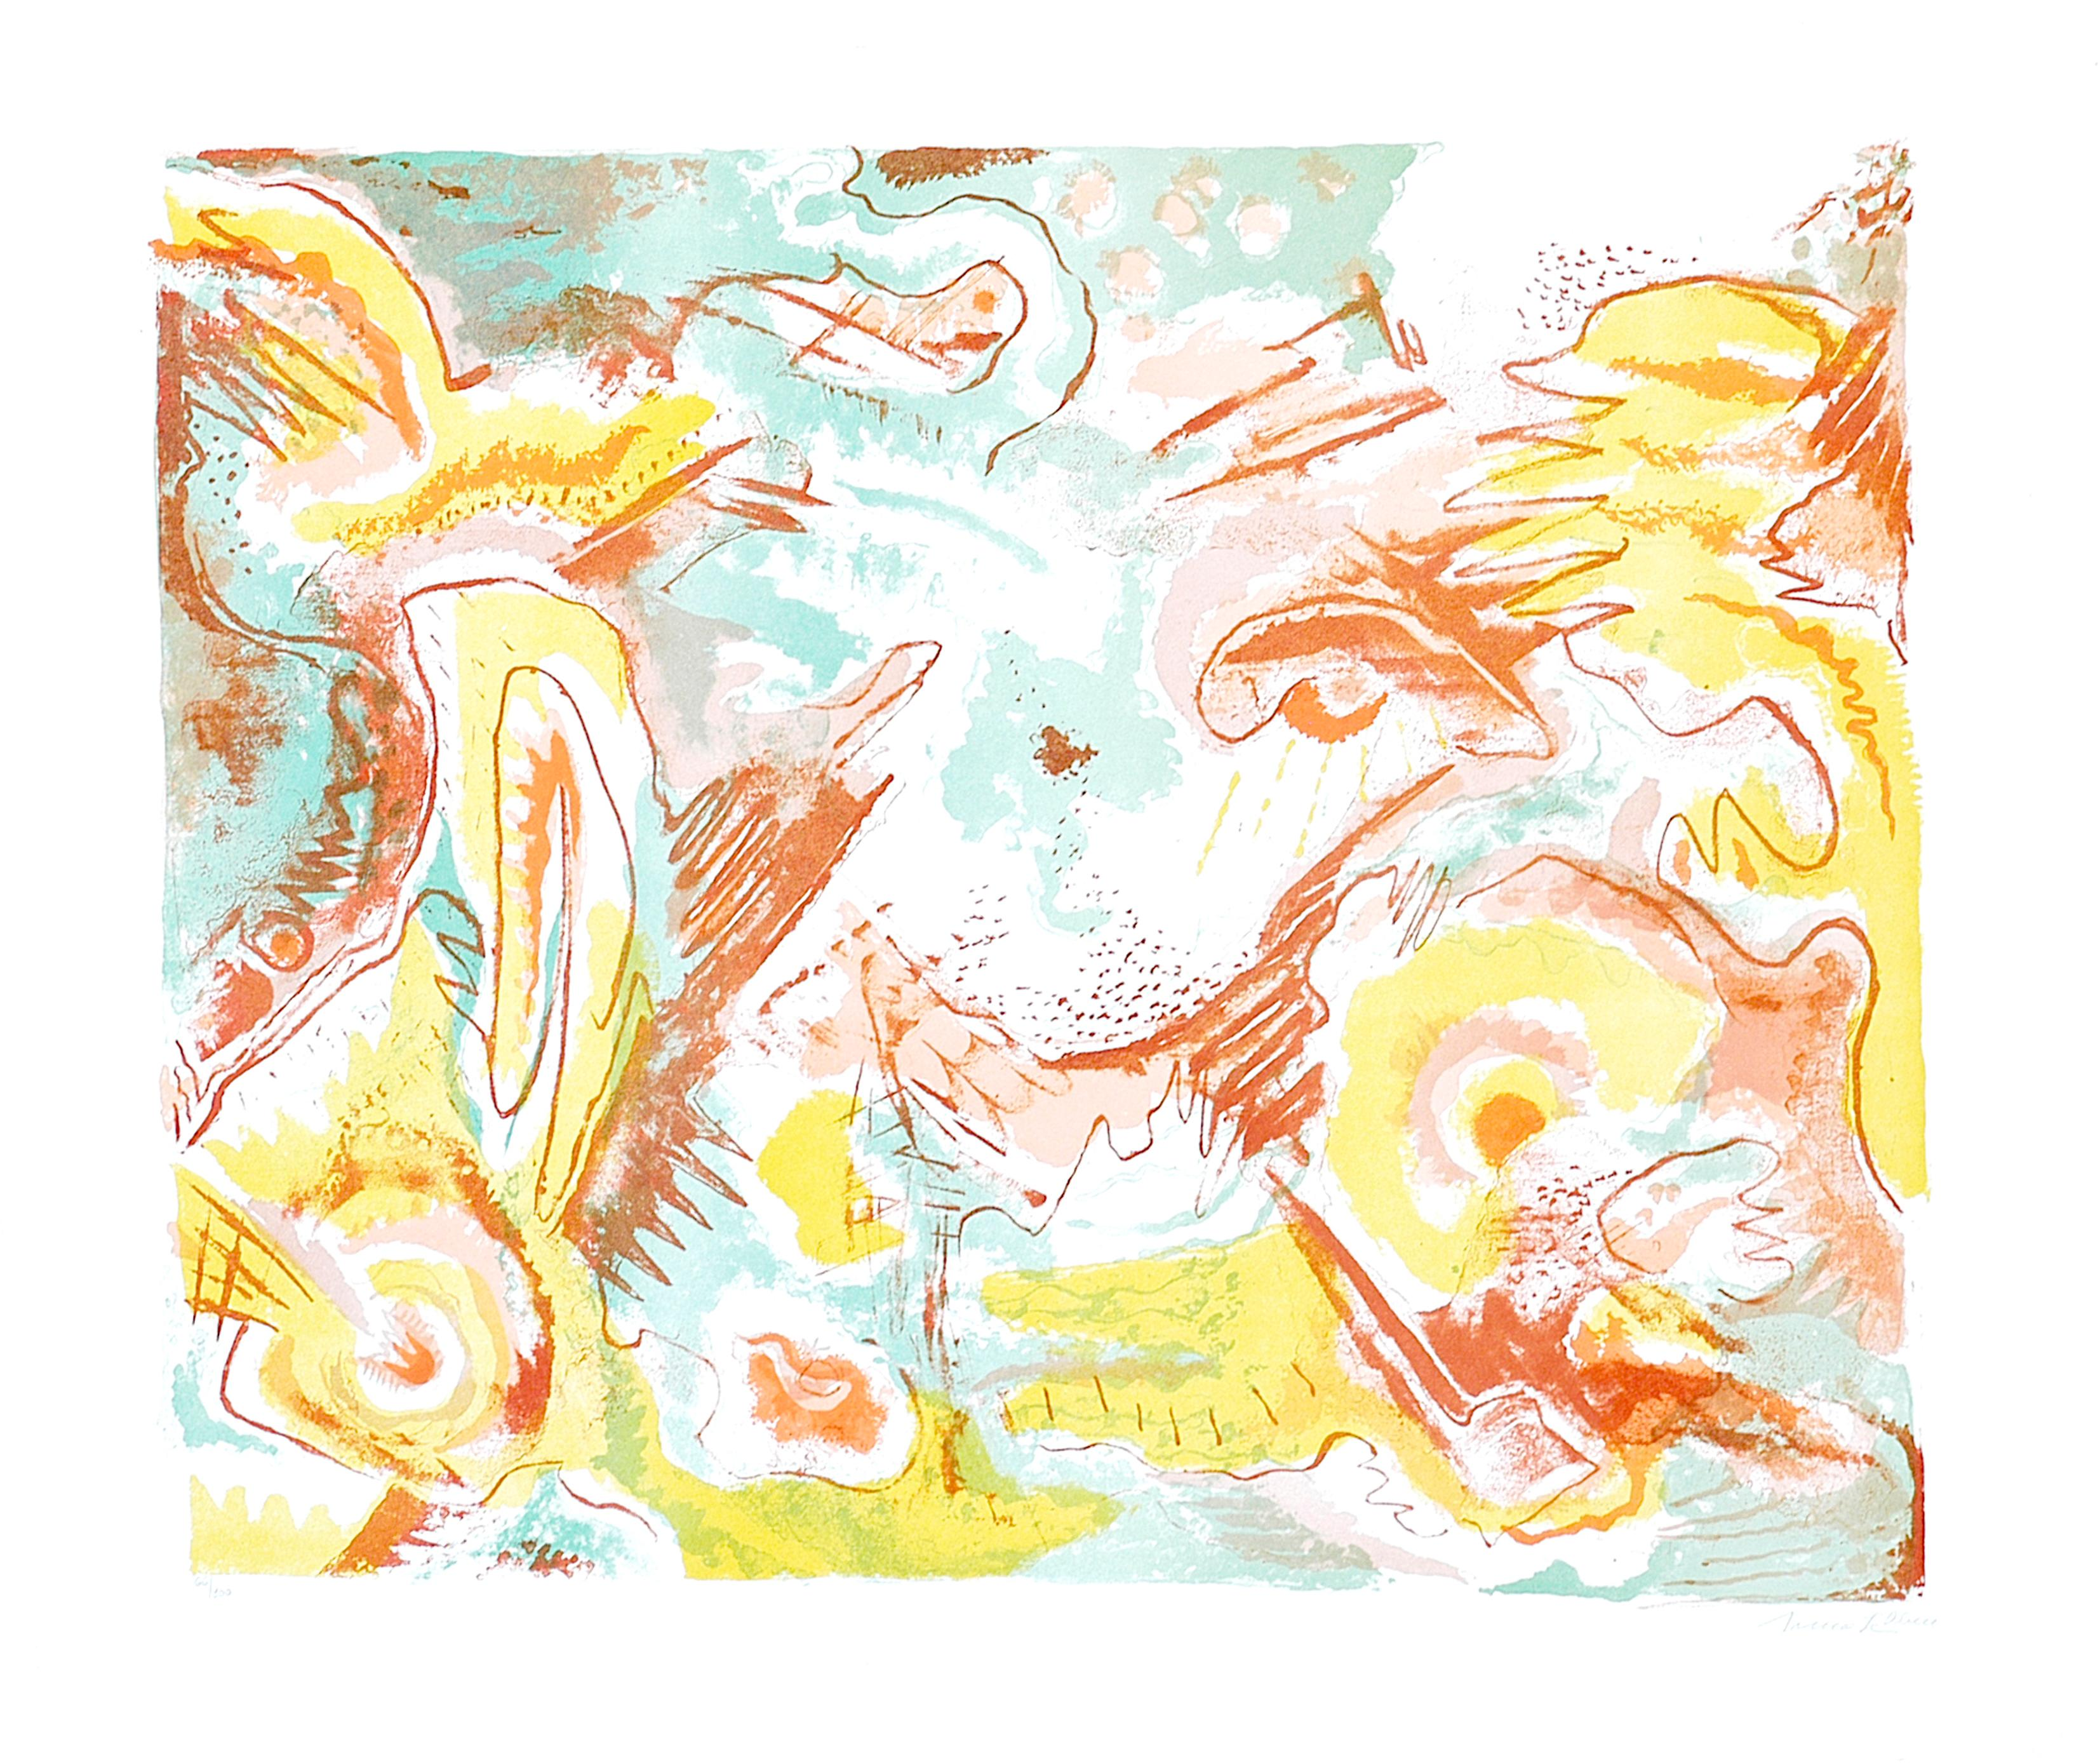 Abstract Landscape - Original Lithograph by Le Oben - 1970 ca.